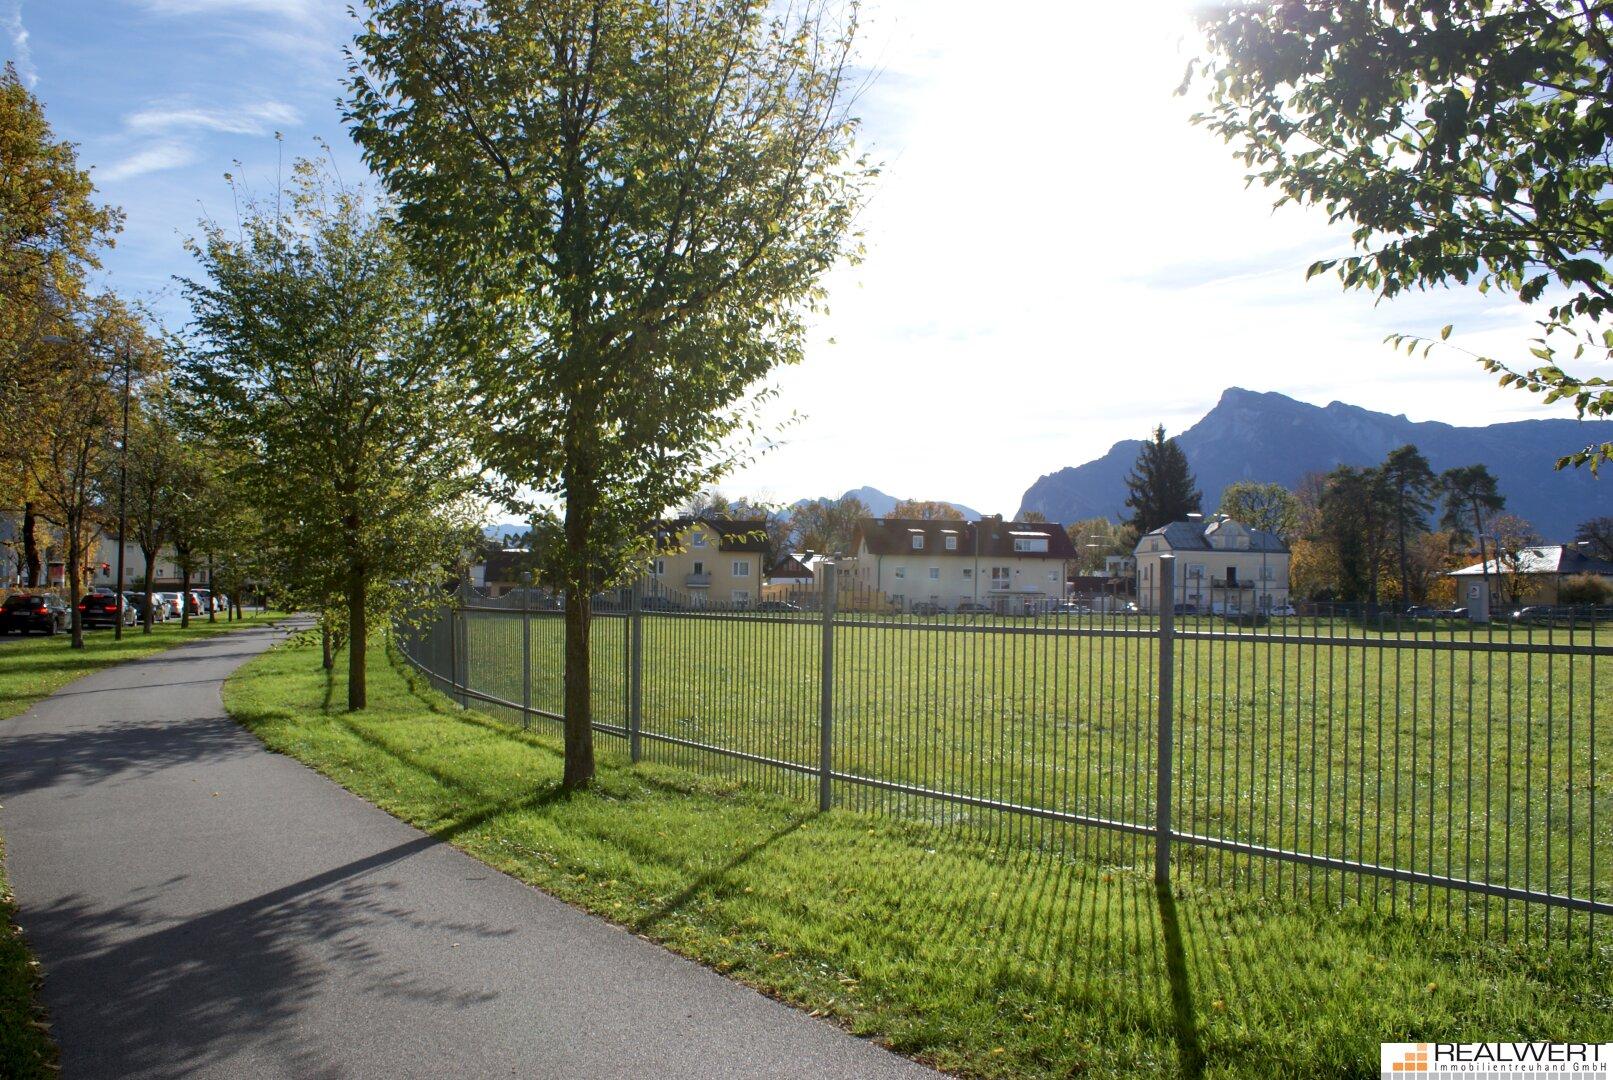 Untersbergblick